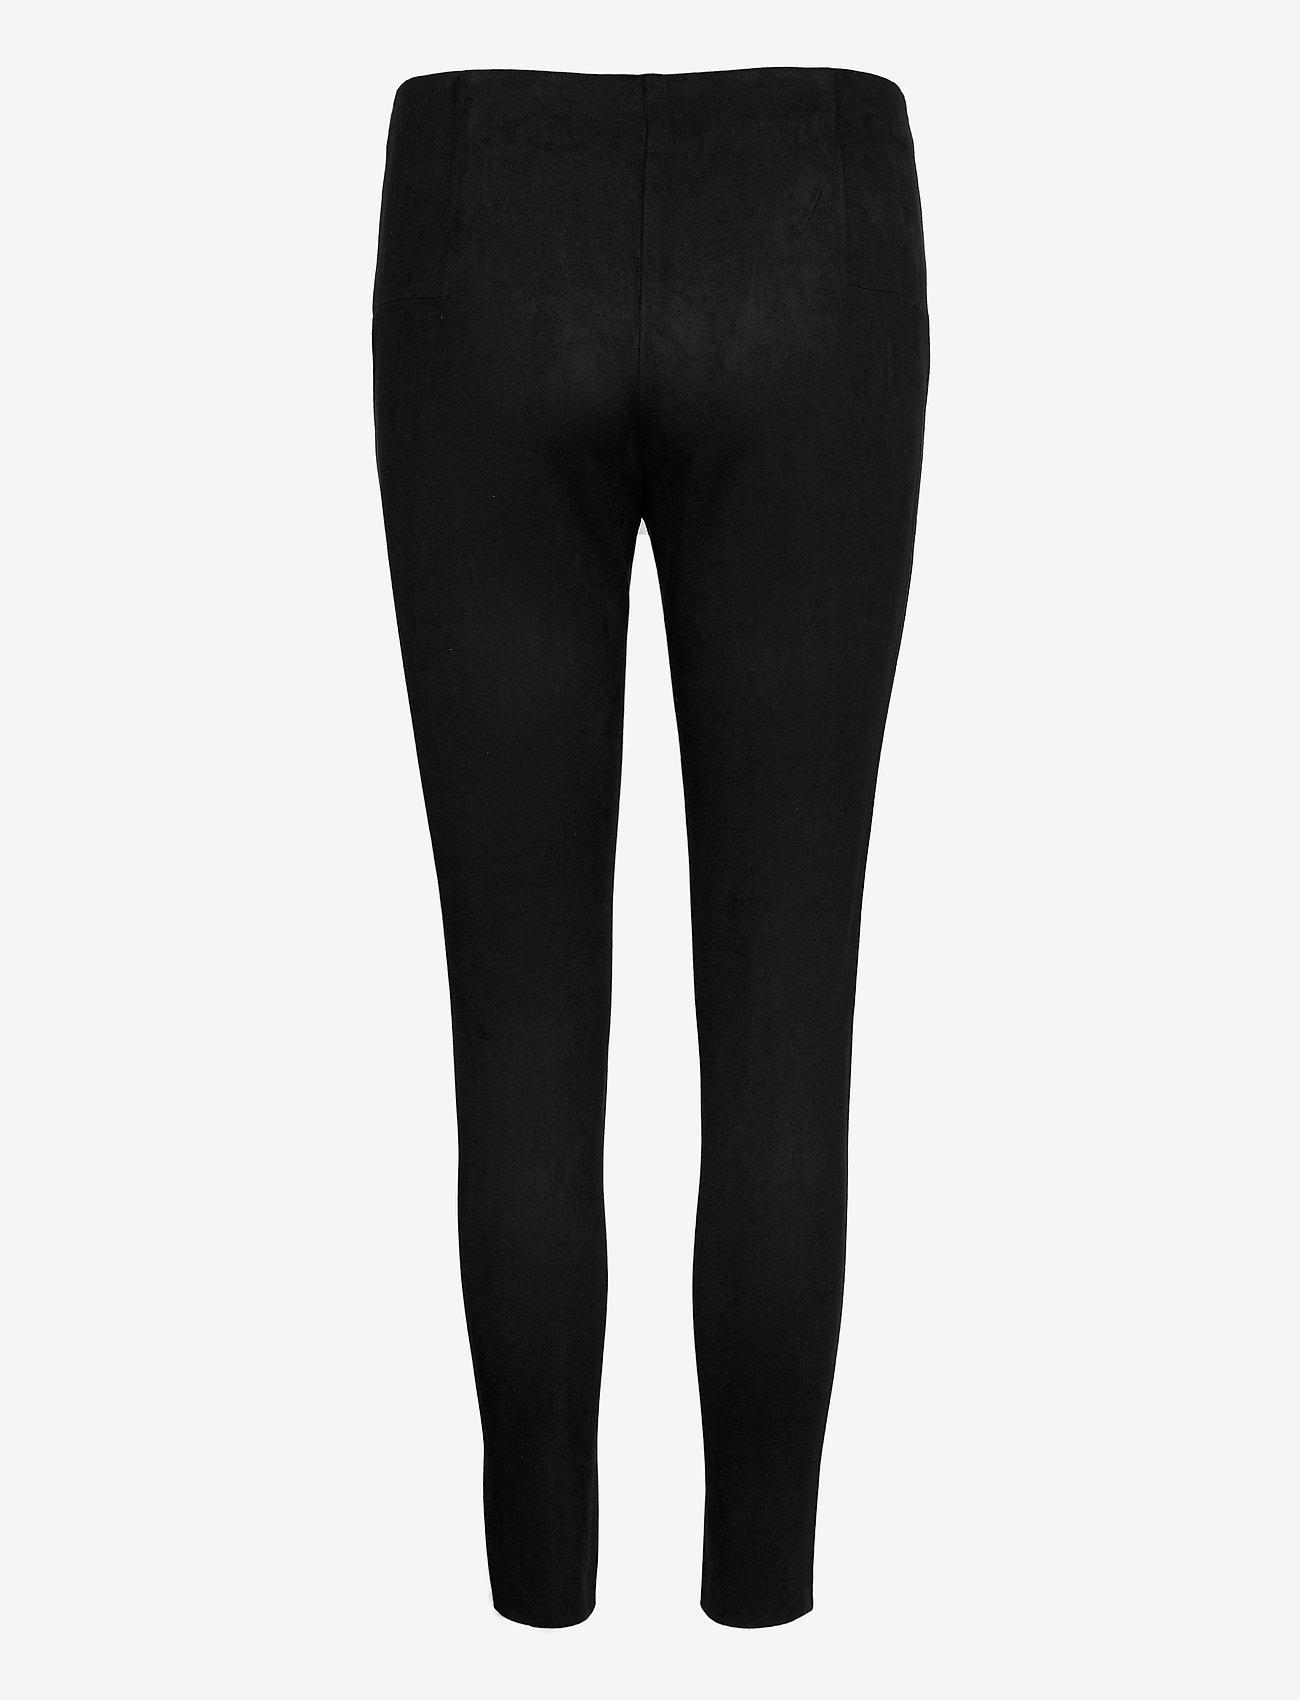 Vero Moda - VMCAVA ZIP NW FAUX SUEDE LEGGING JRS BOO - leggings - black - 1